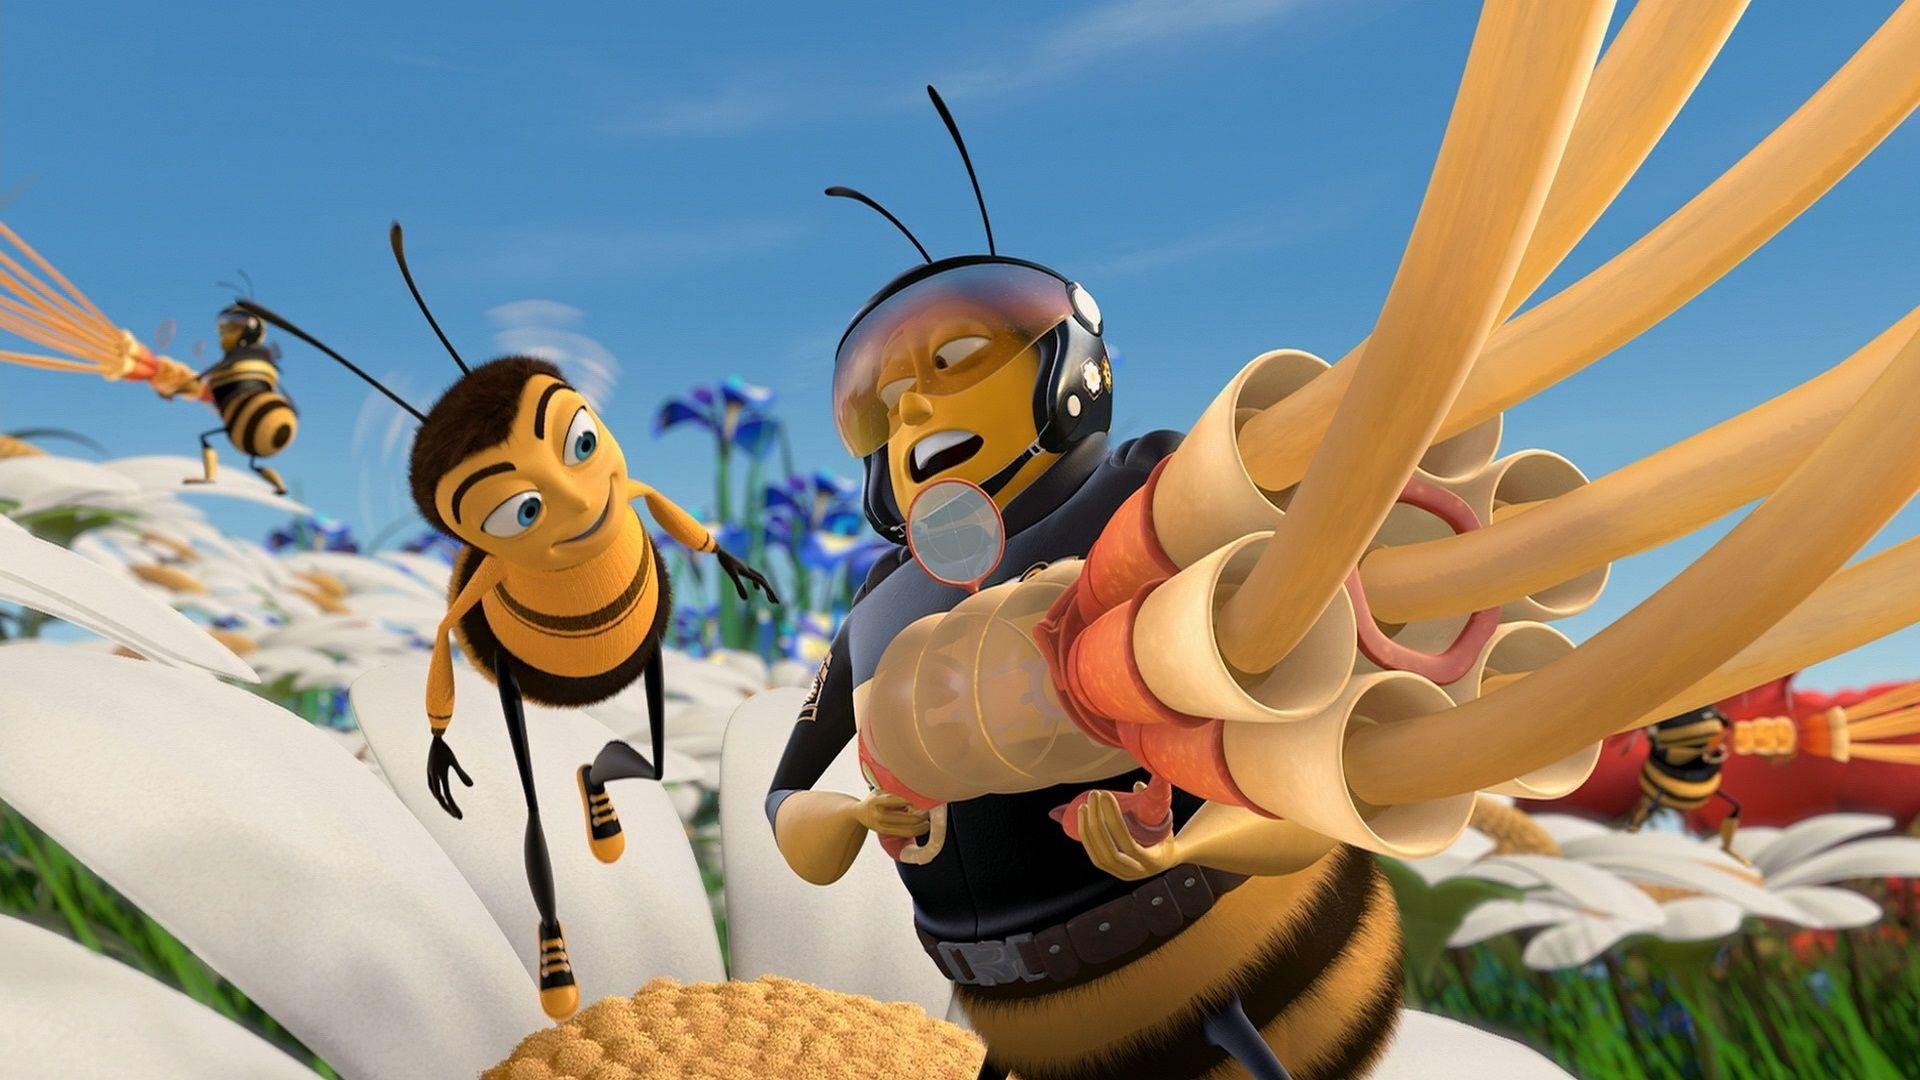 Bee Movie Background Bee Movie Game Bee Movie Movie Wallpapers